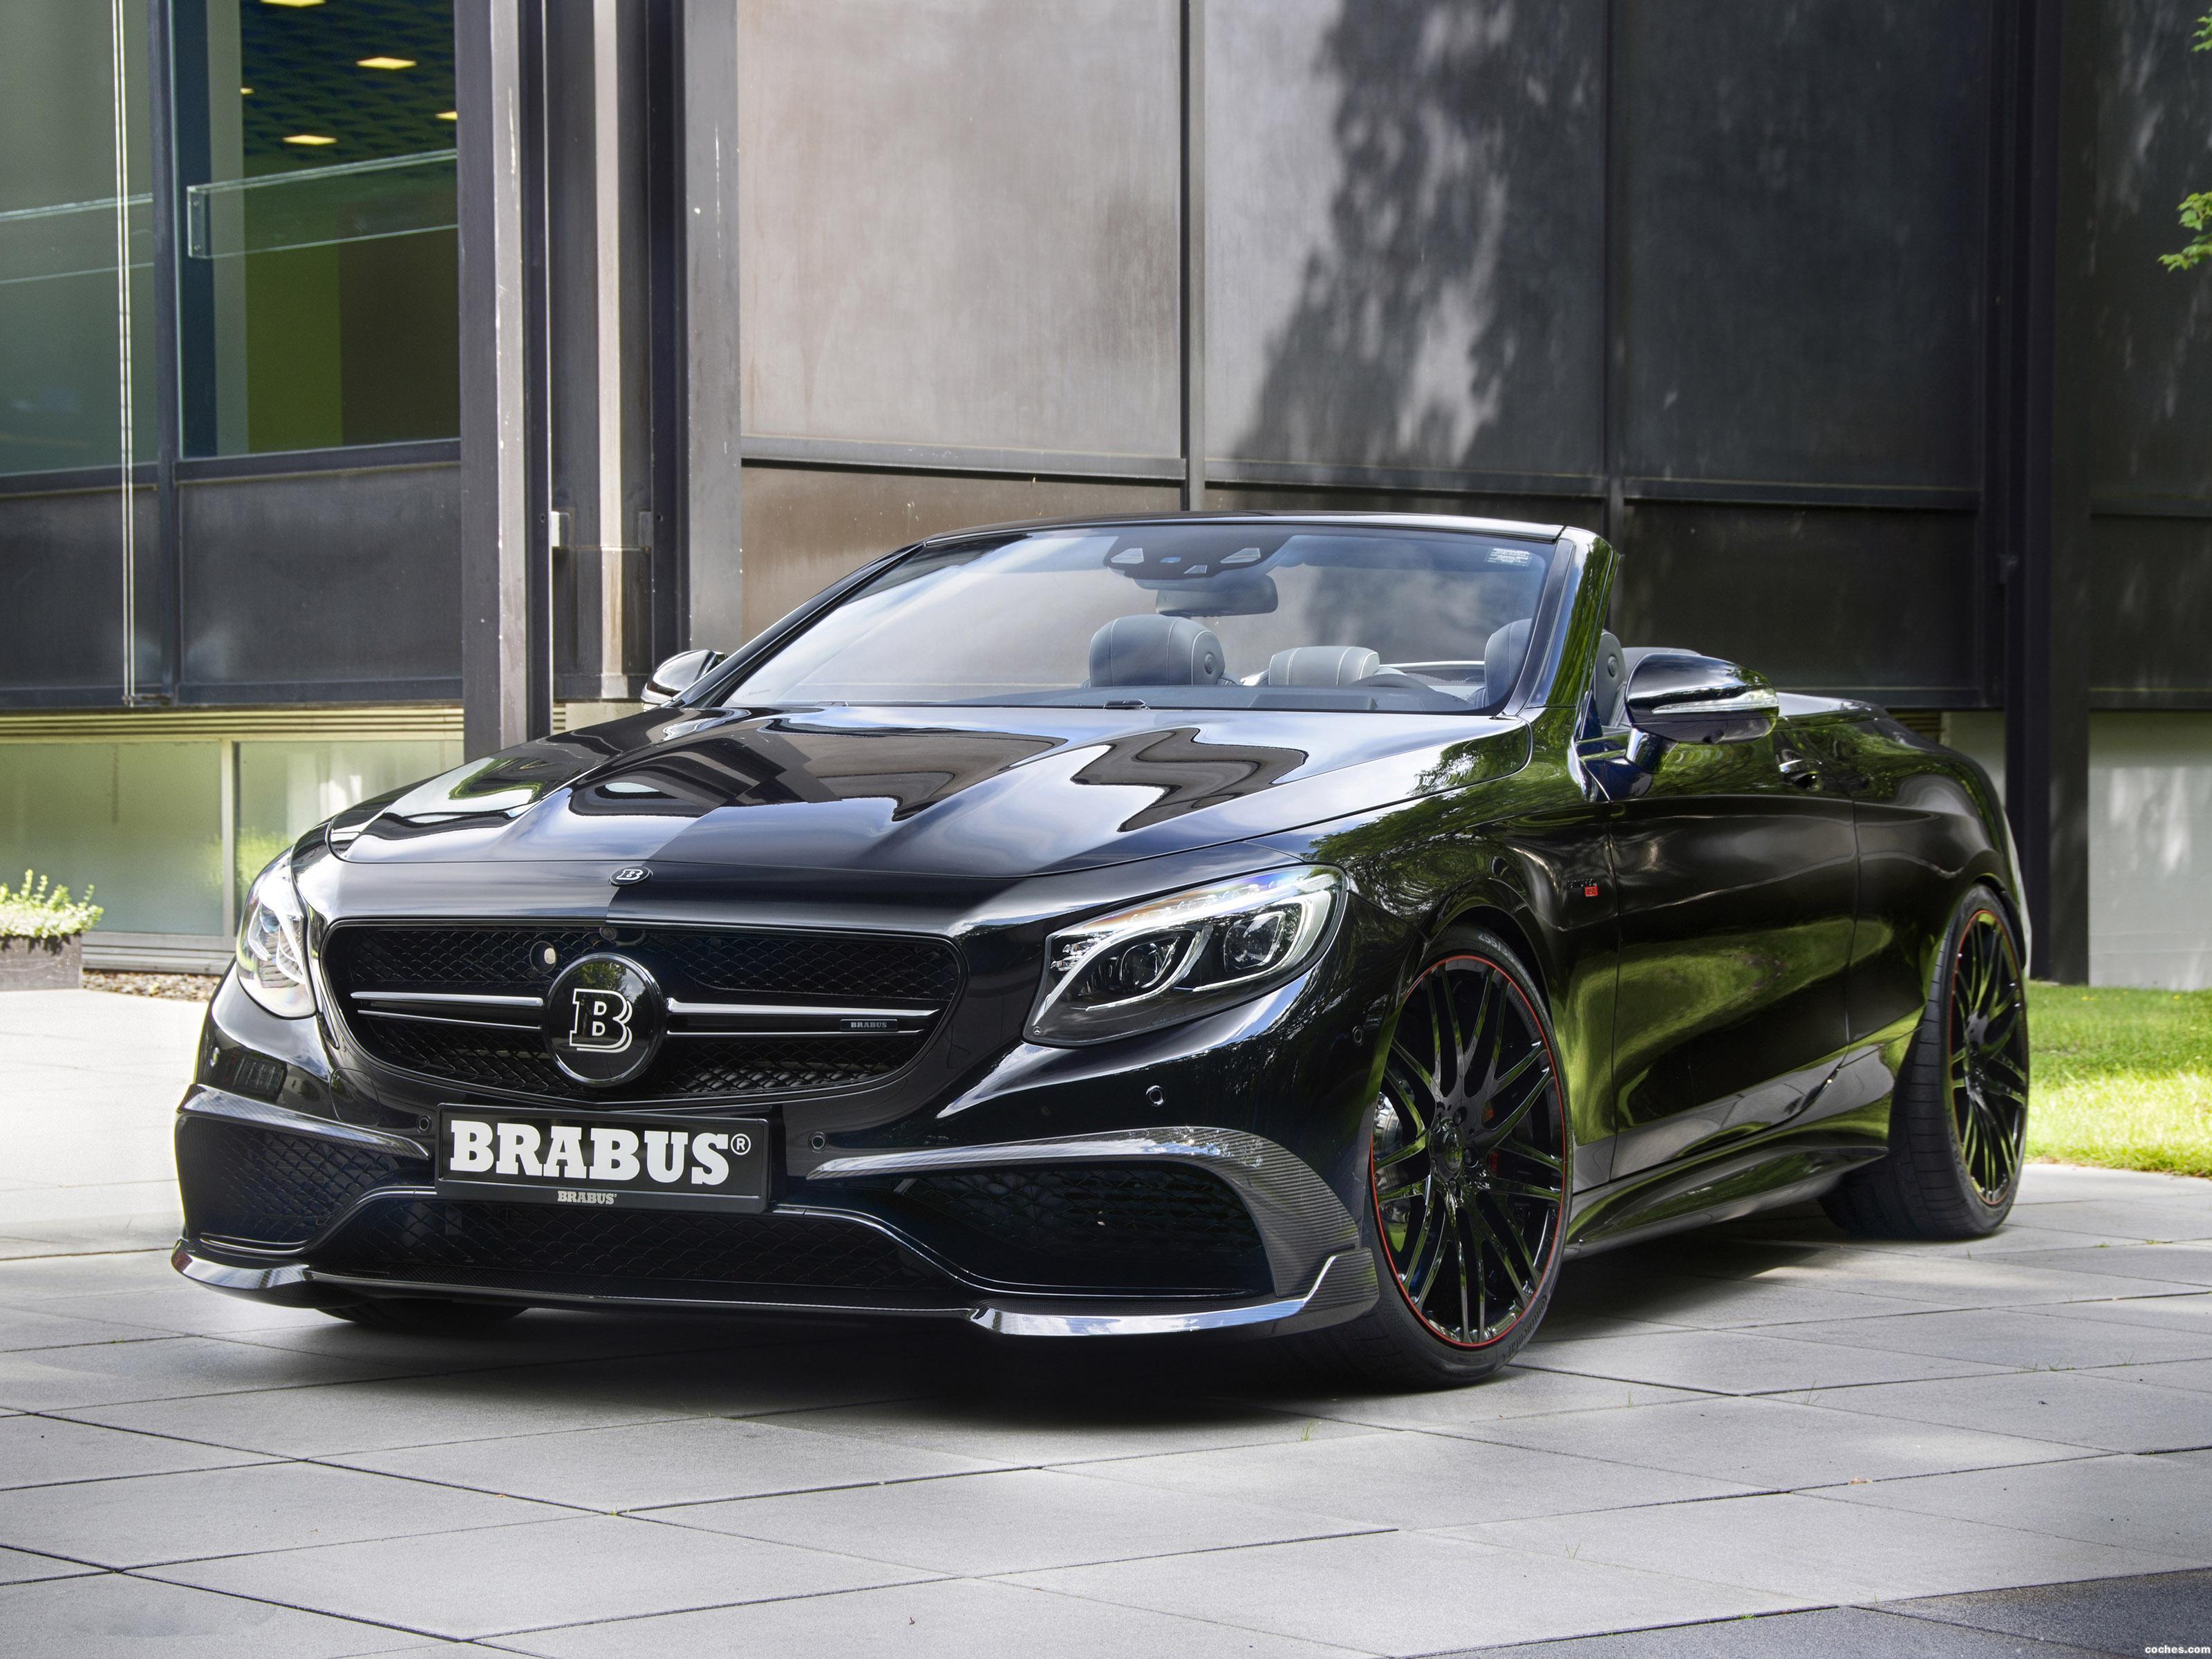 Foto 0 de Brabus Mercedes SL 850 Cabriolet A217 2016